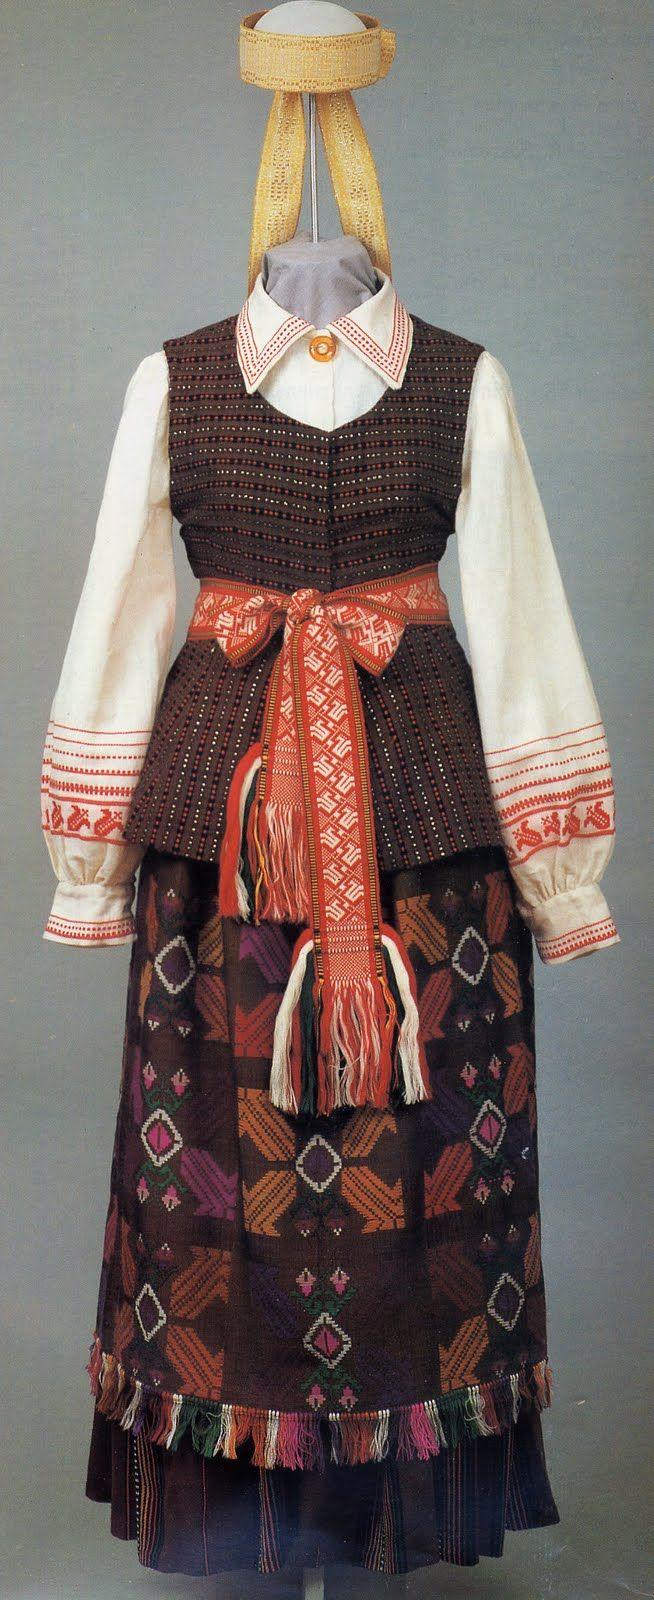 Costume of Kapsai region, Lithuania